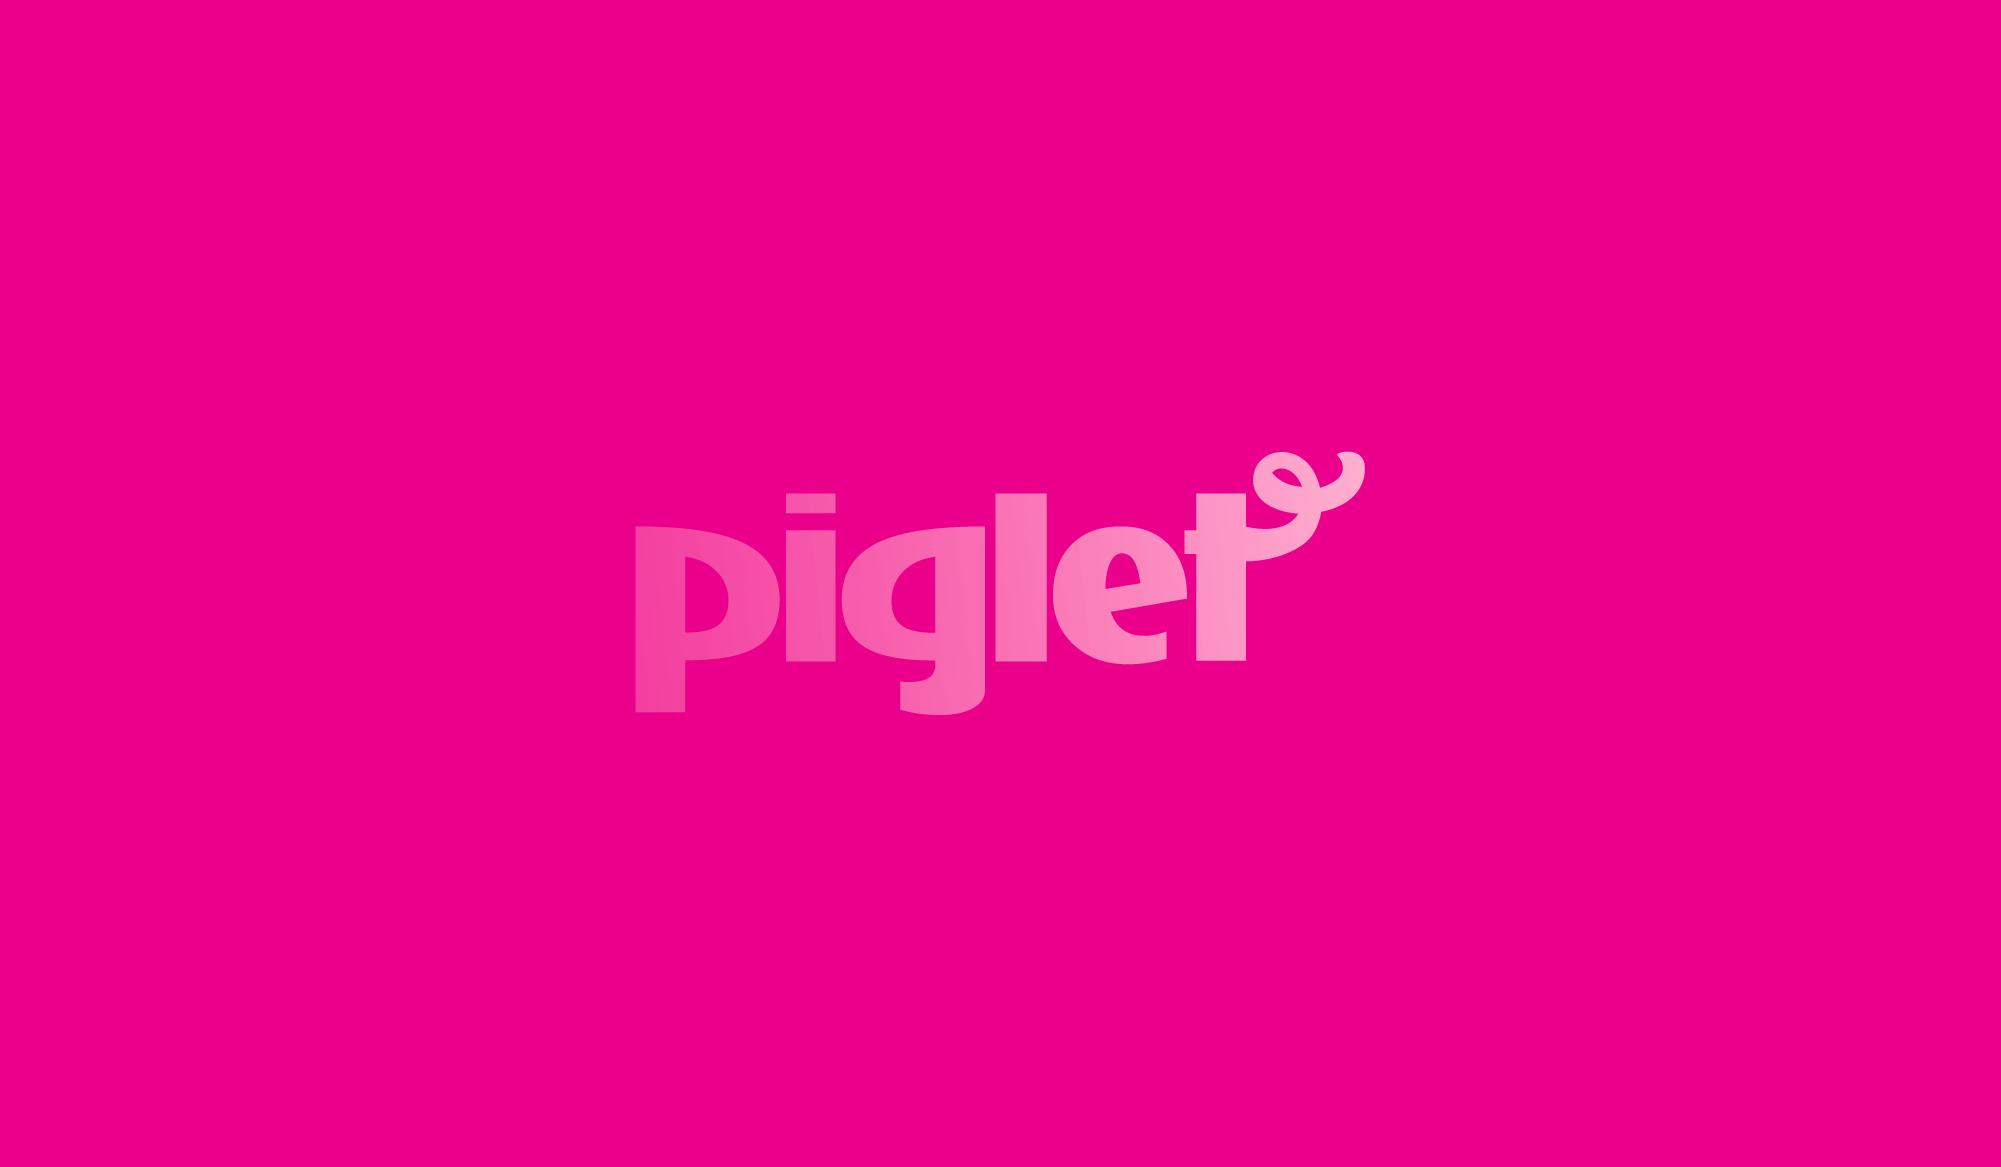 sb-logo-piglet-13